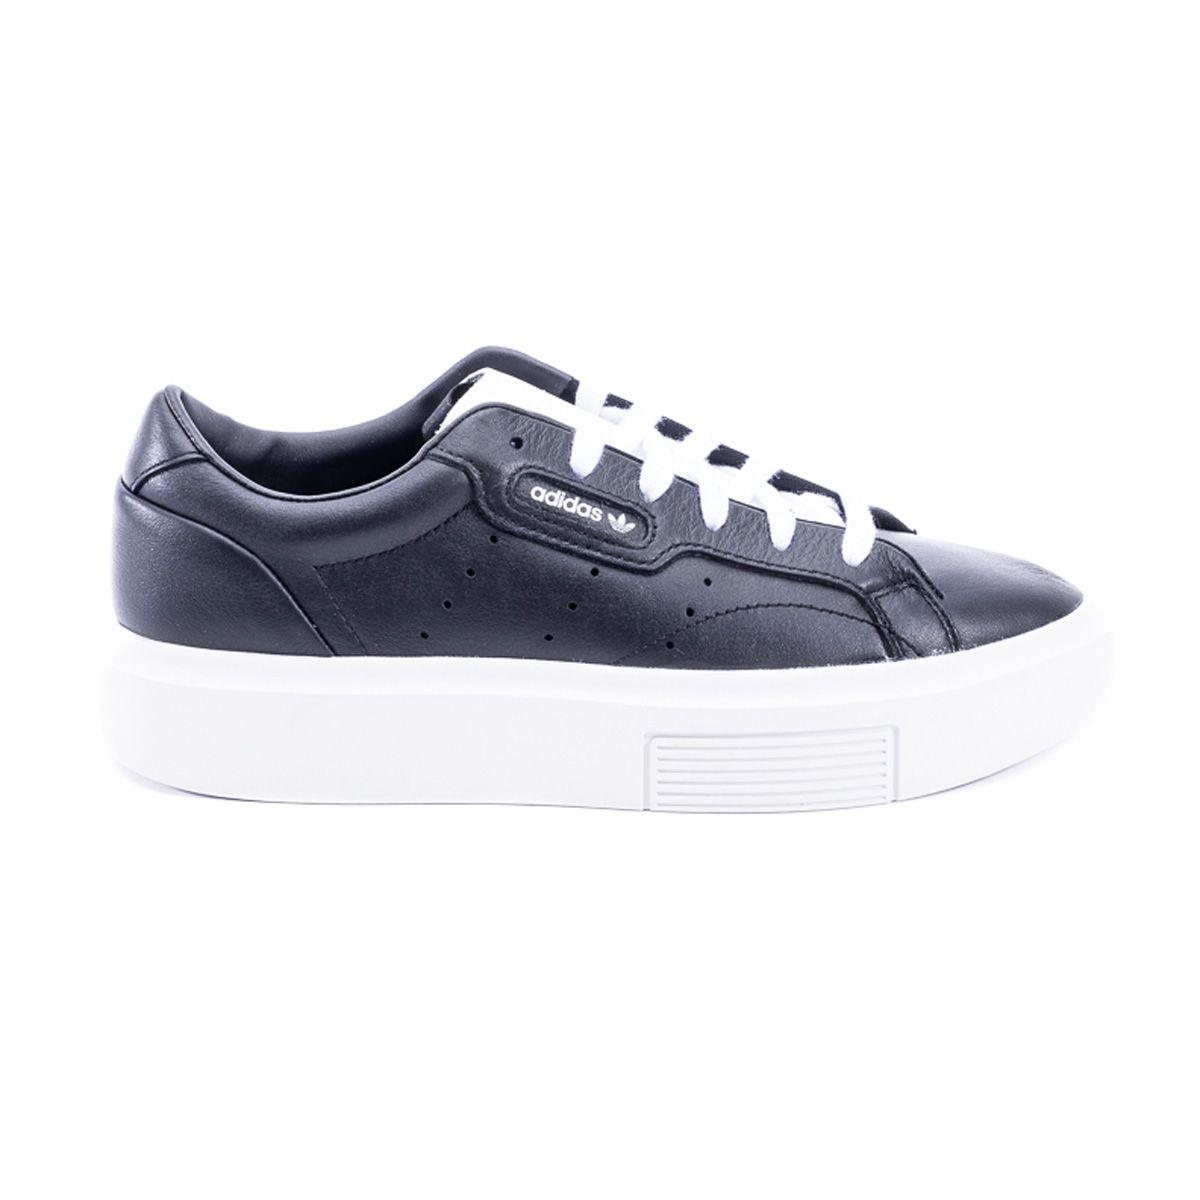 8ddbbffdb Adidas Adidas Sleek Super Leather Sneakers - BLACK - 10990401 | italist